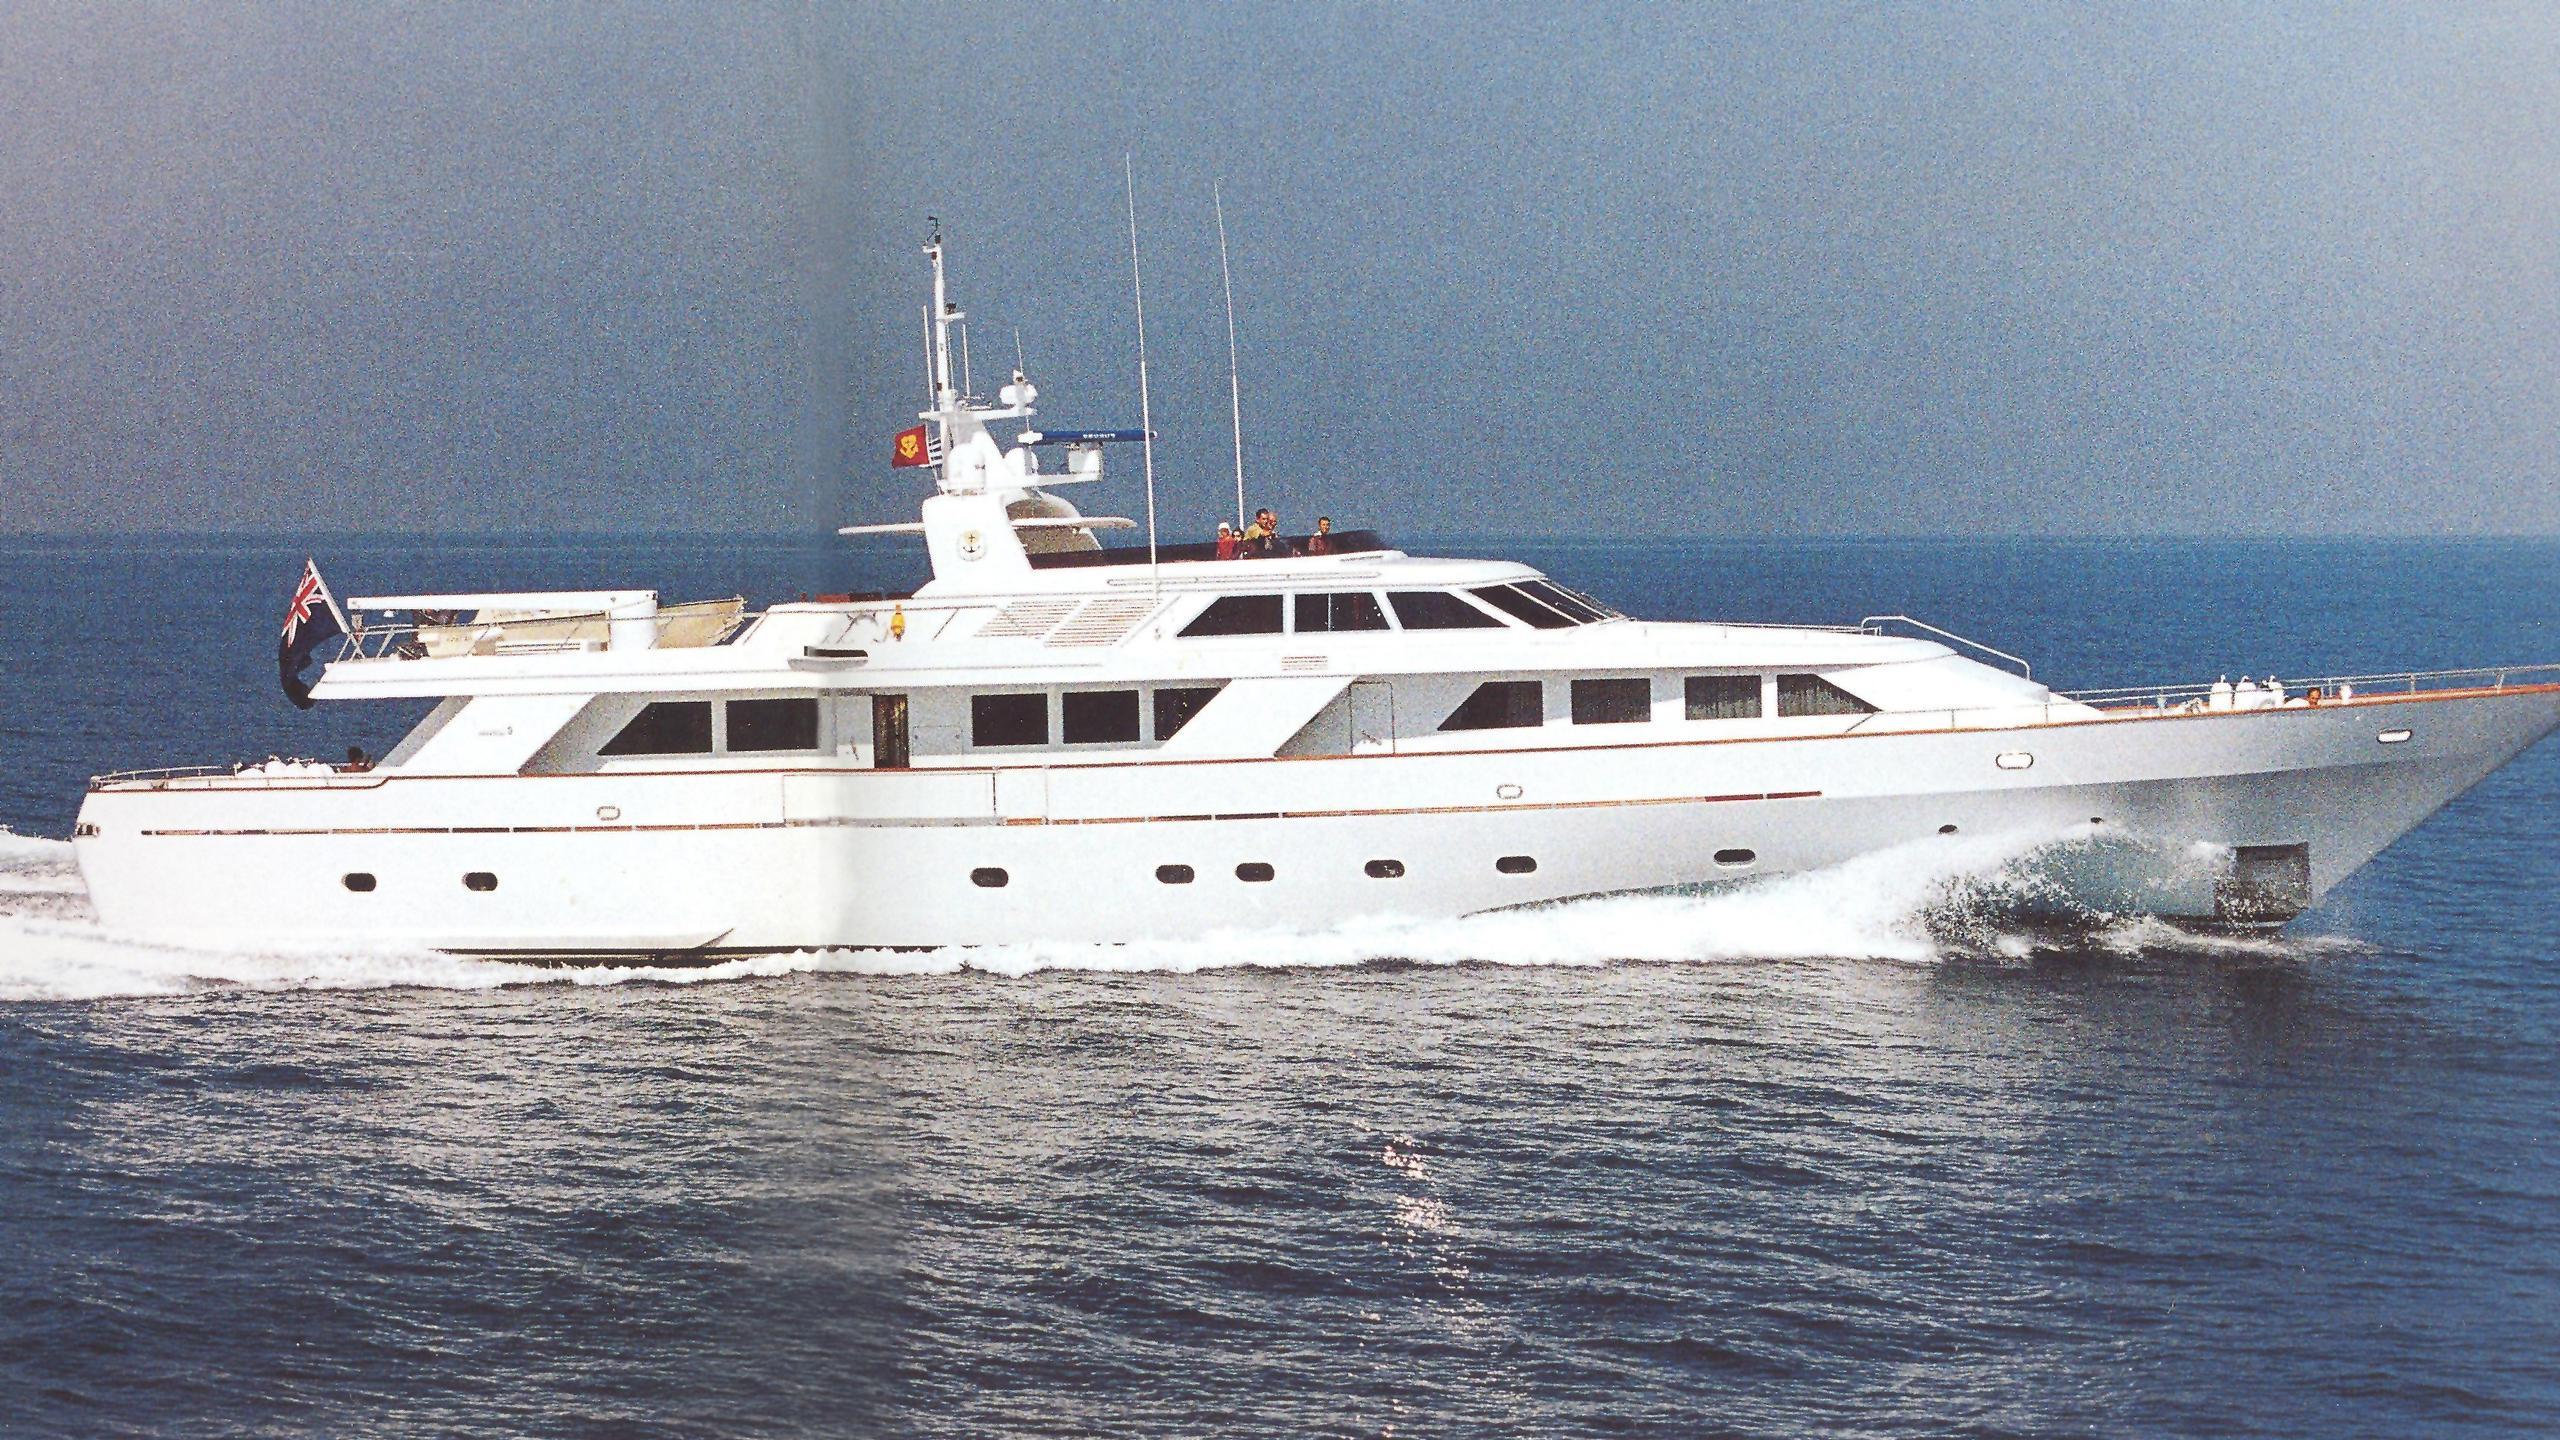 Okeanos Aggressor yacht